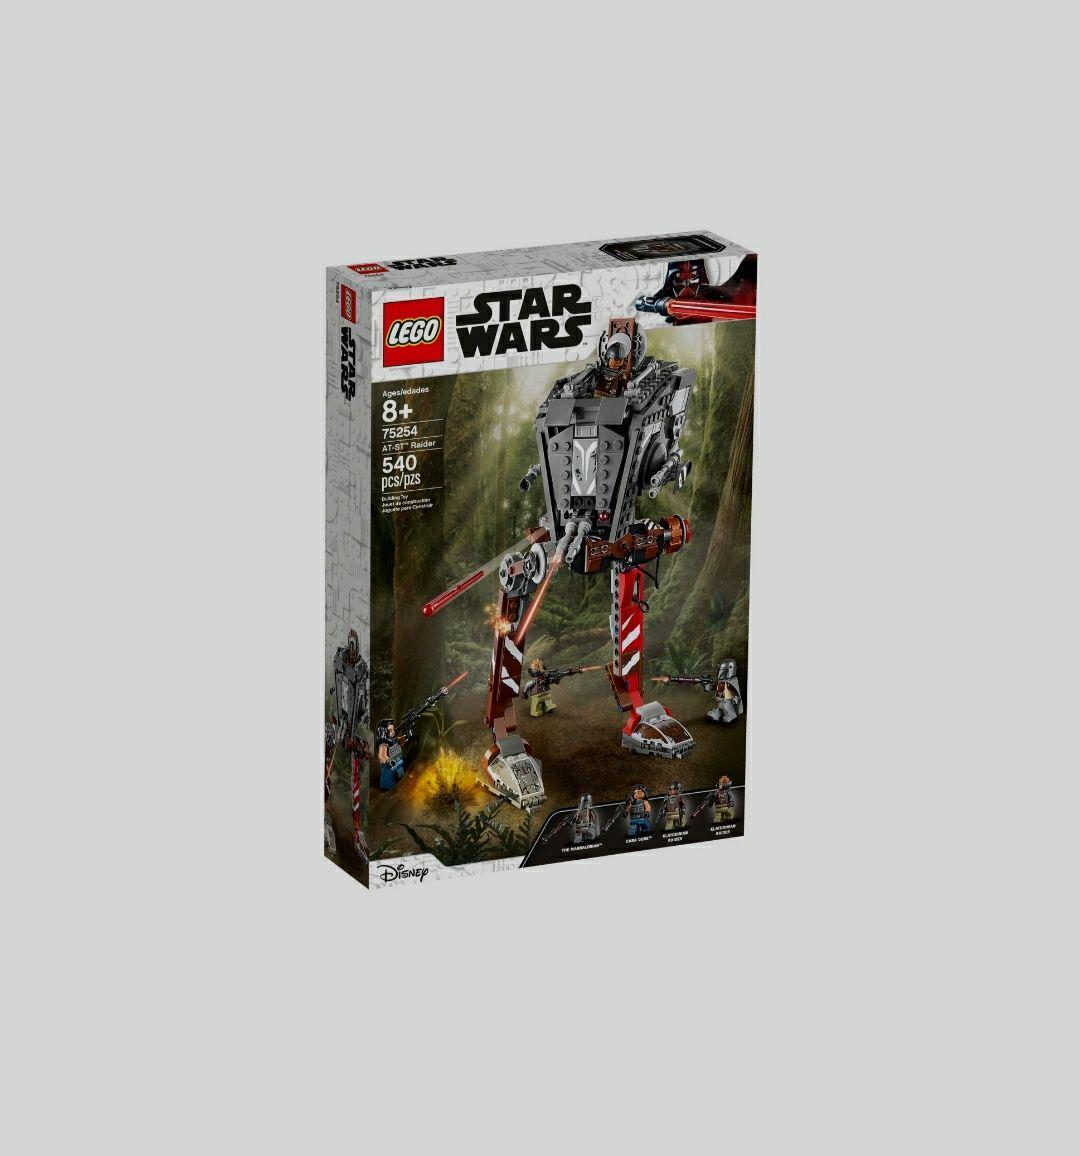 [Amazon] LEGO 75254 Star Wars AT-ST-Räuber (Lieferbar ab 17.04.21)